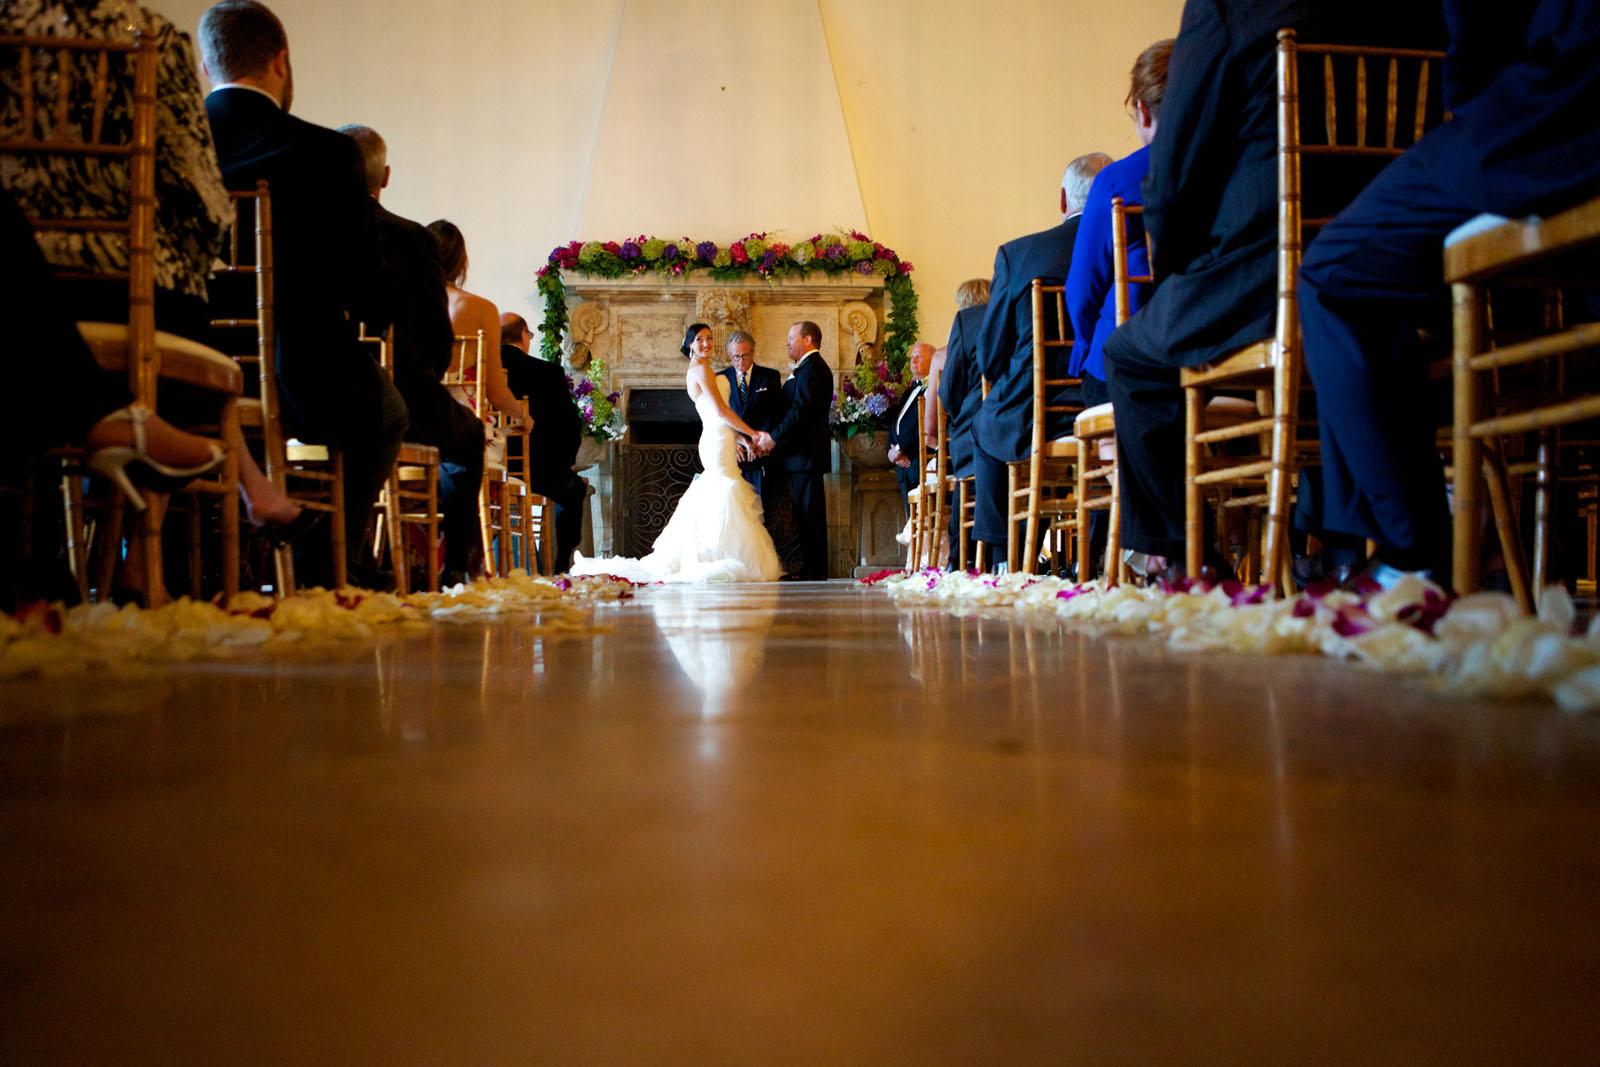 Arden_Photography_Sea_Island_Wedding24.jpg